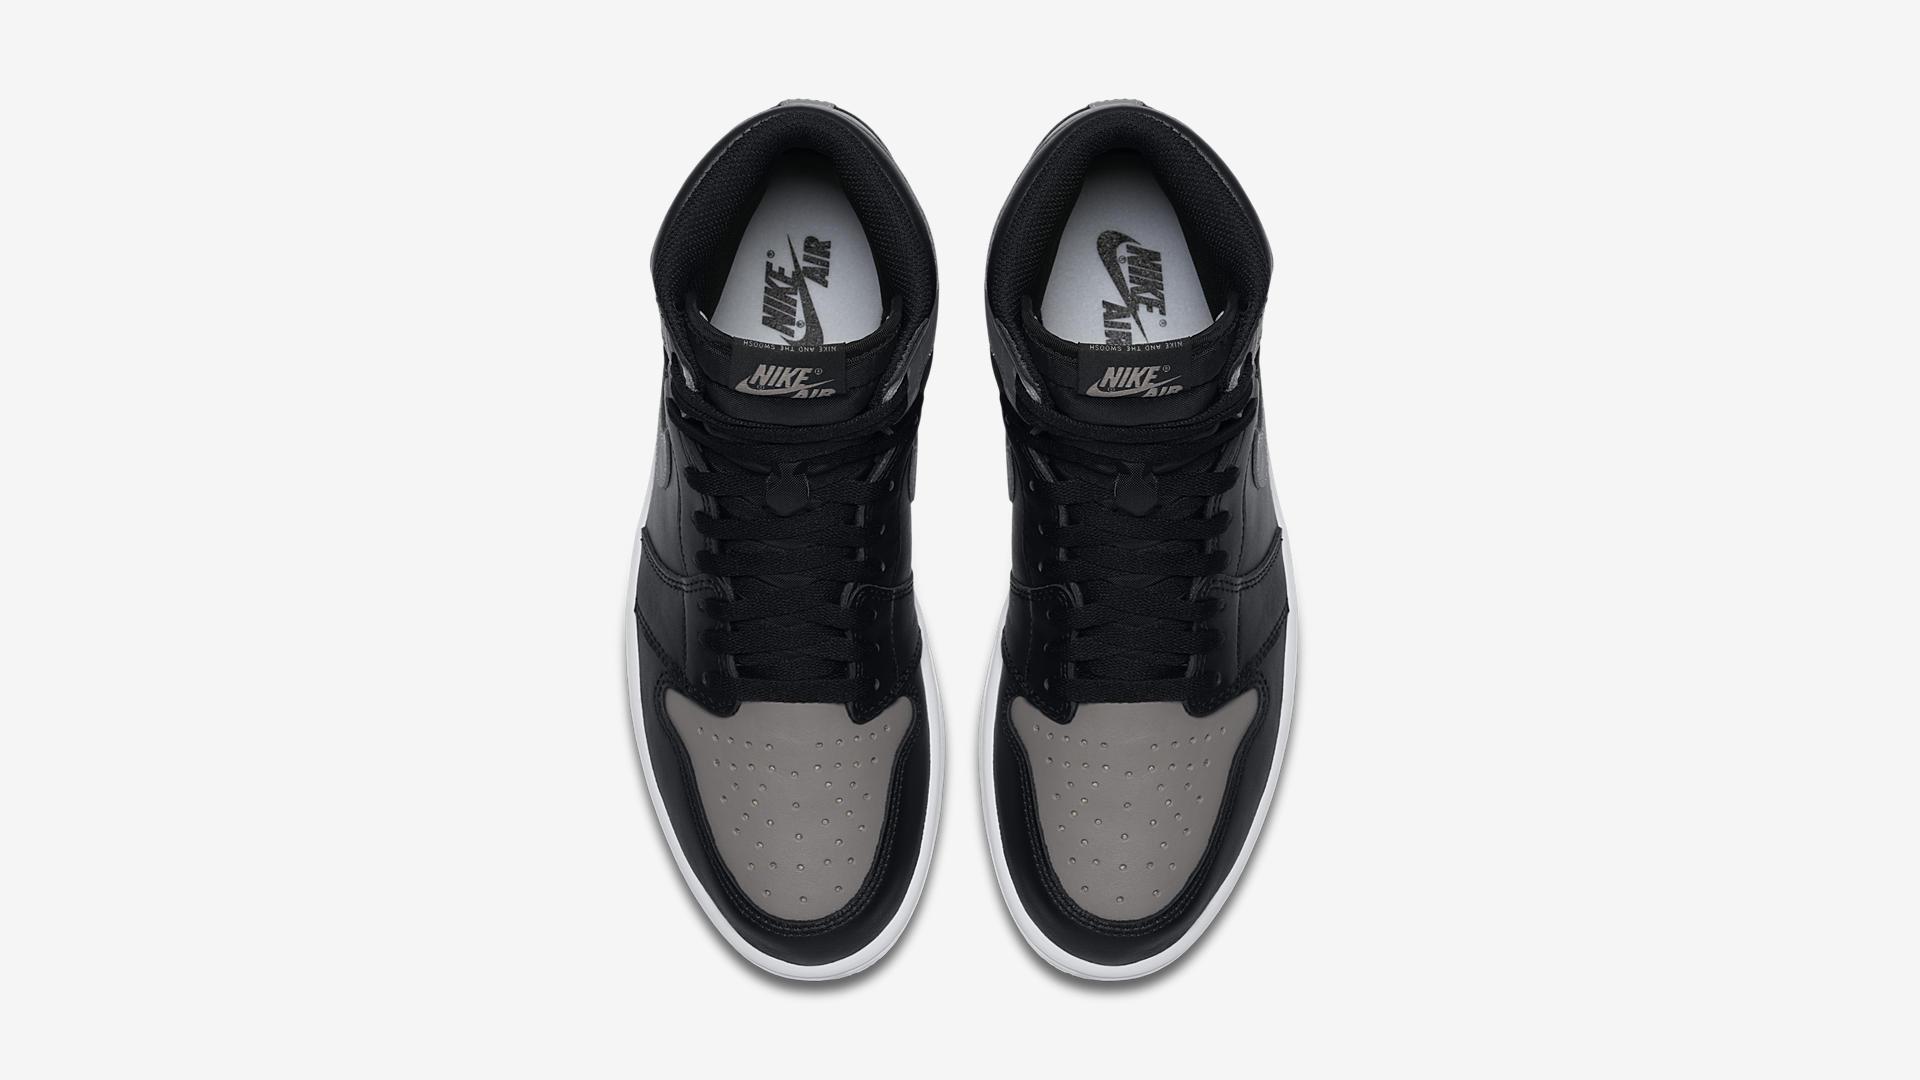 555088 013 Air Jordan 1 Retro High OG Shadow 2